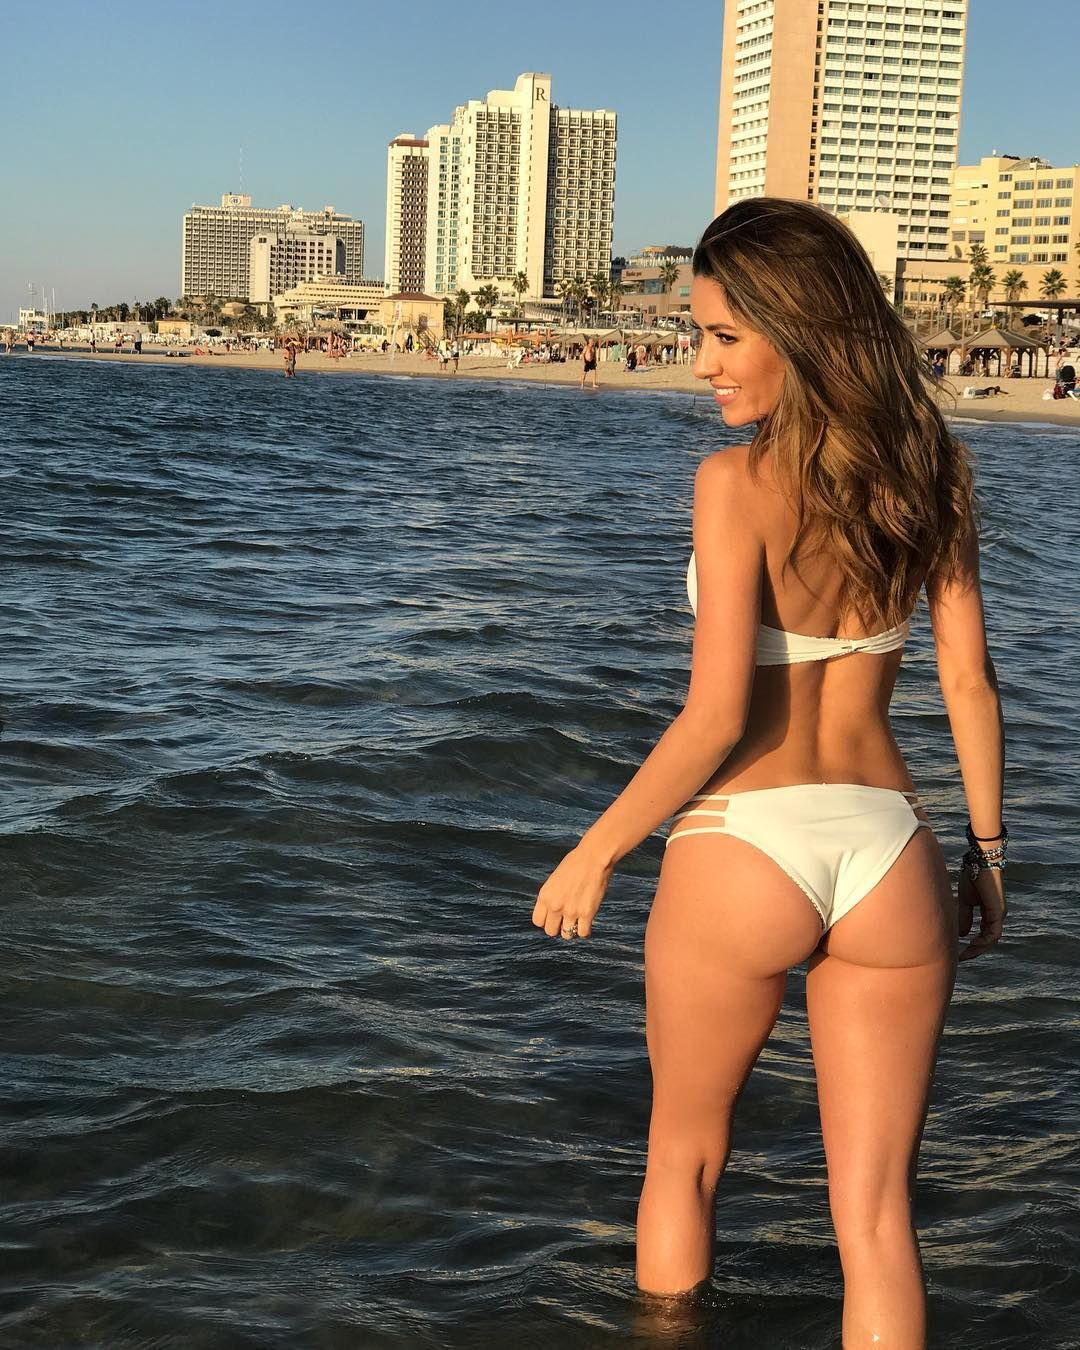 Celebrites Abagail Spencer nude (36 photos), Sexy, Sideboobs, Feet, cleavage 2017